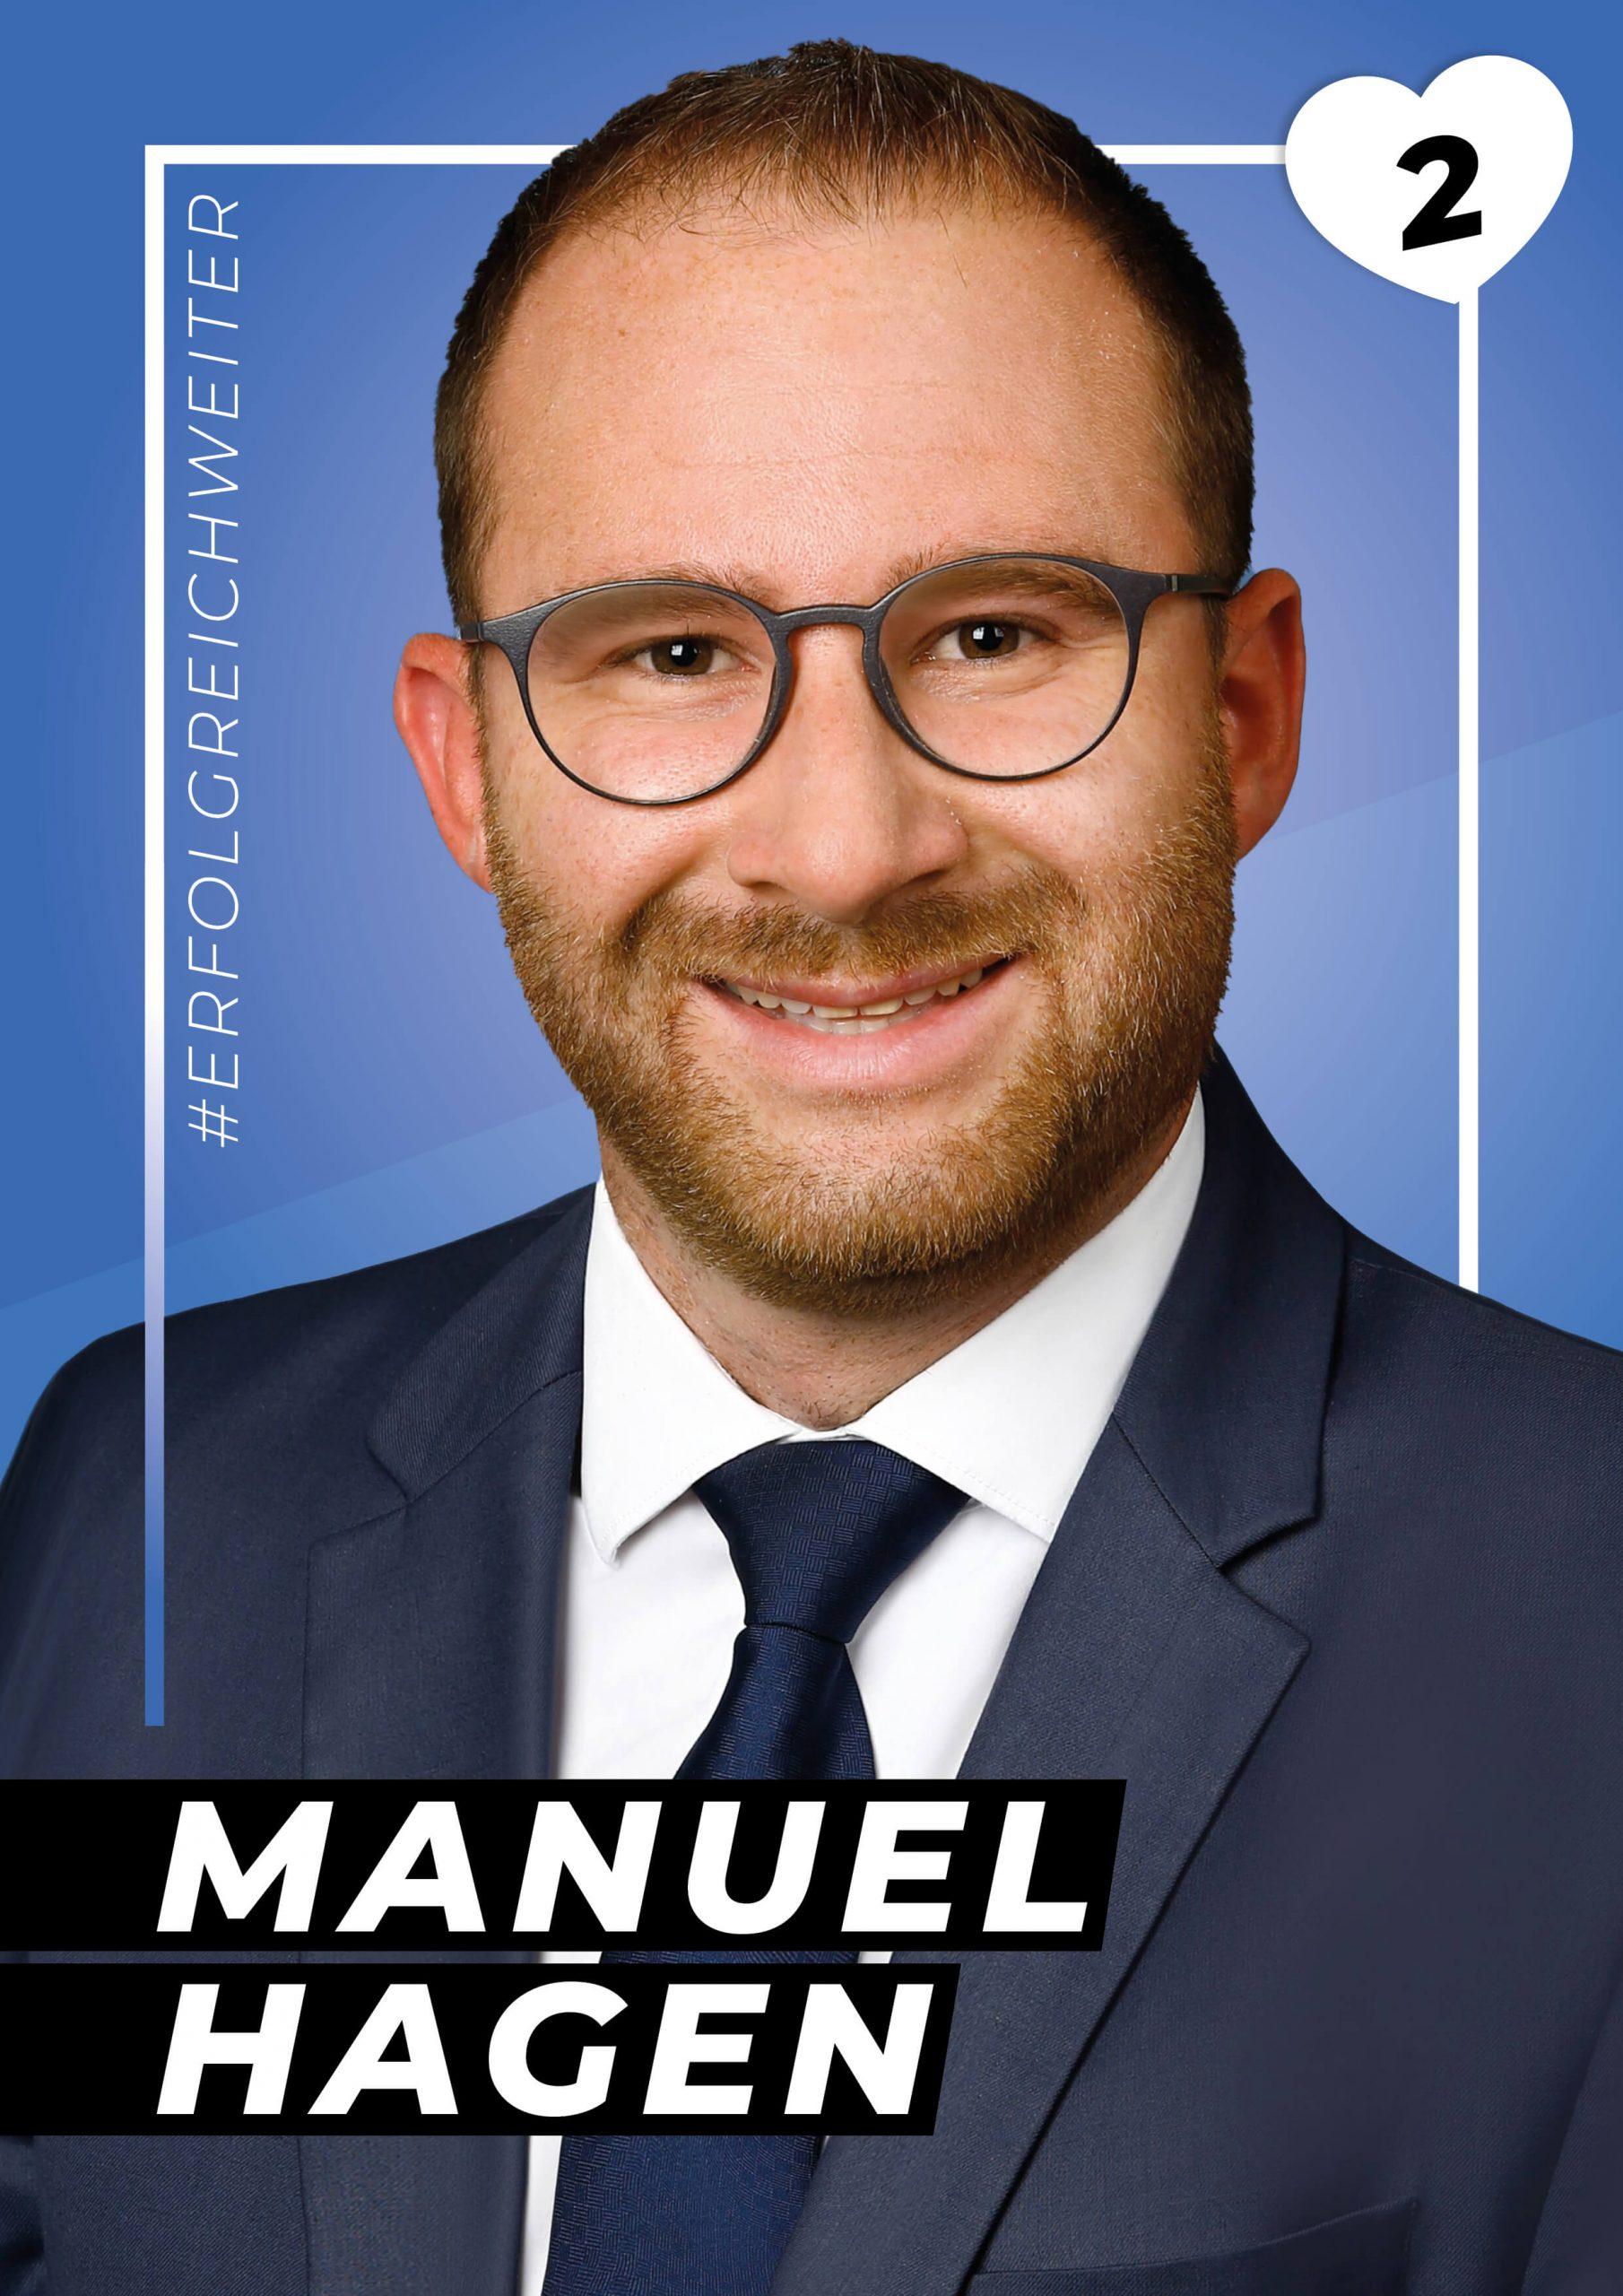 2019 Bürgerliste Köfering_Kandidaten2